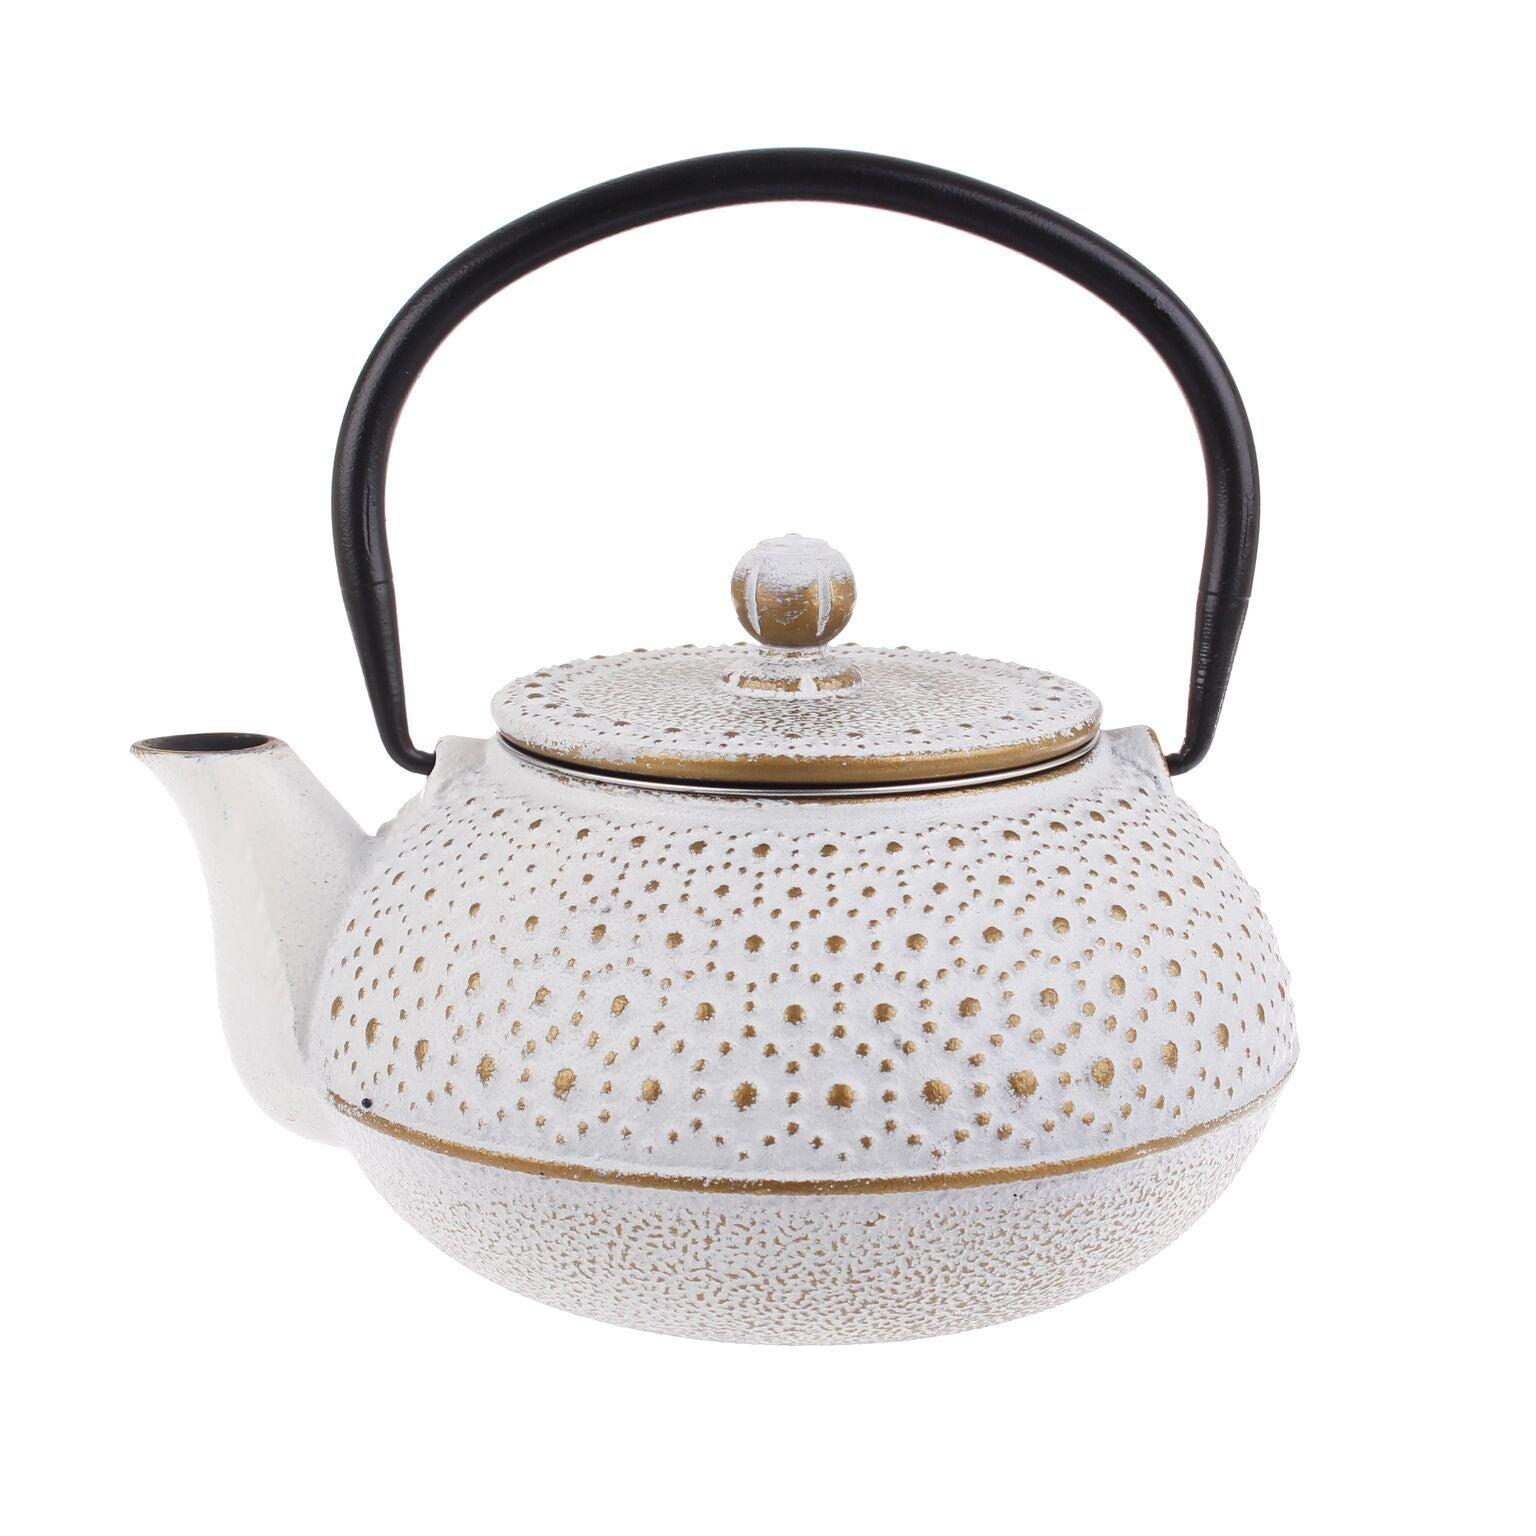 Teaology Cast Iron Teapot 600ml Tea Pot Kettle Strainer White